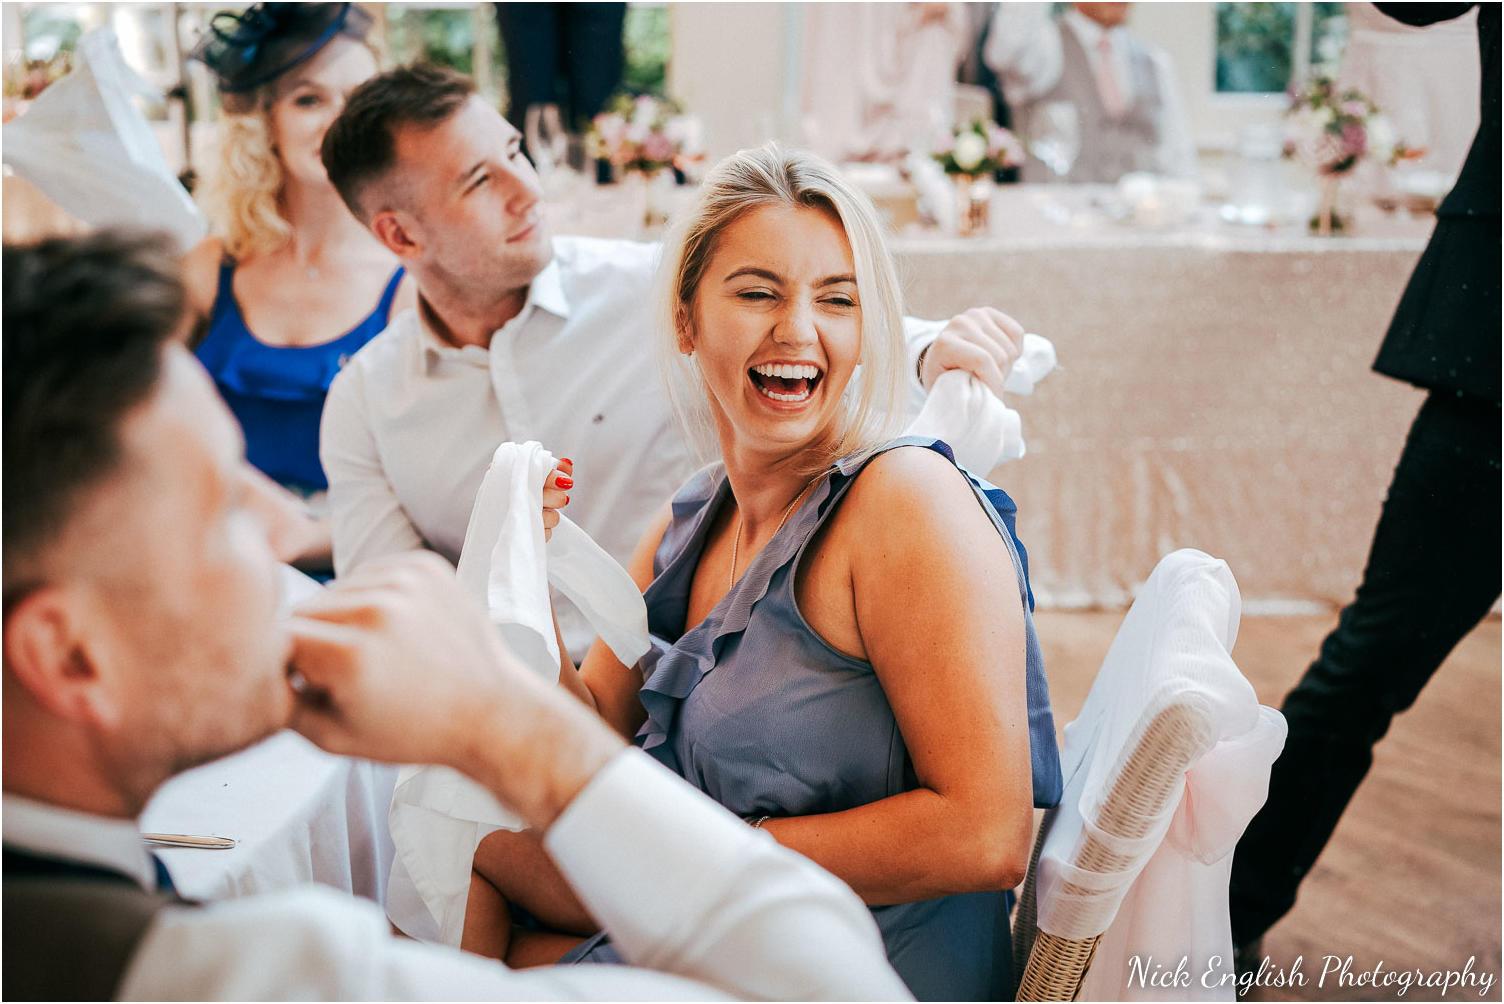 Mitton_Hall_Wedding_Photograph-132.jpg